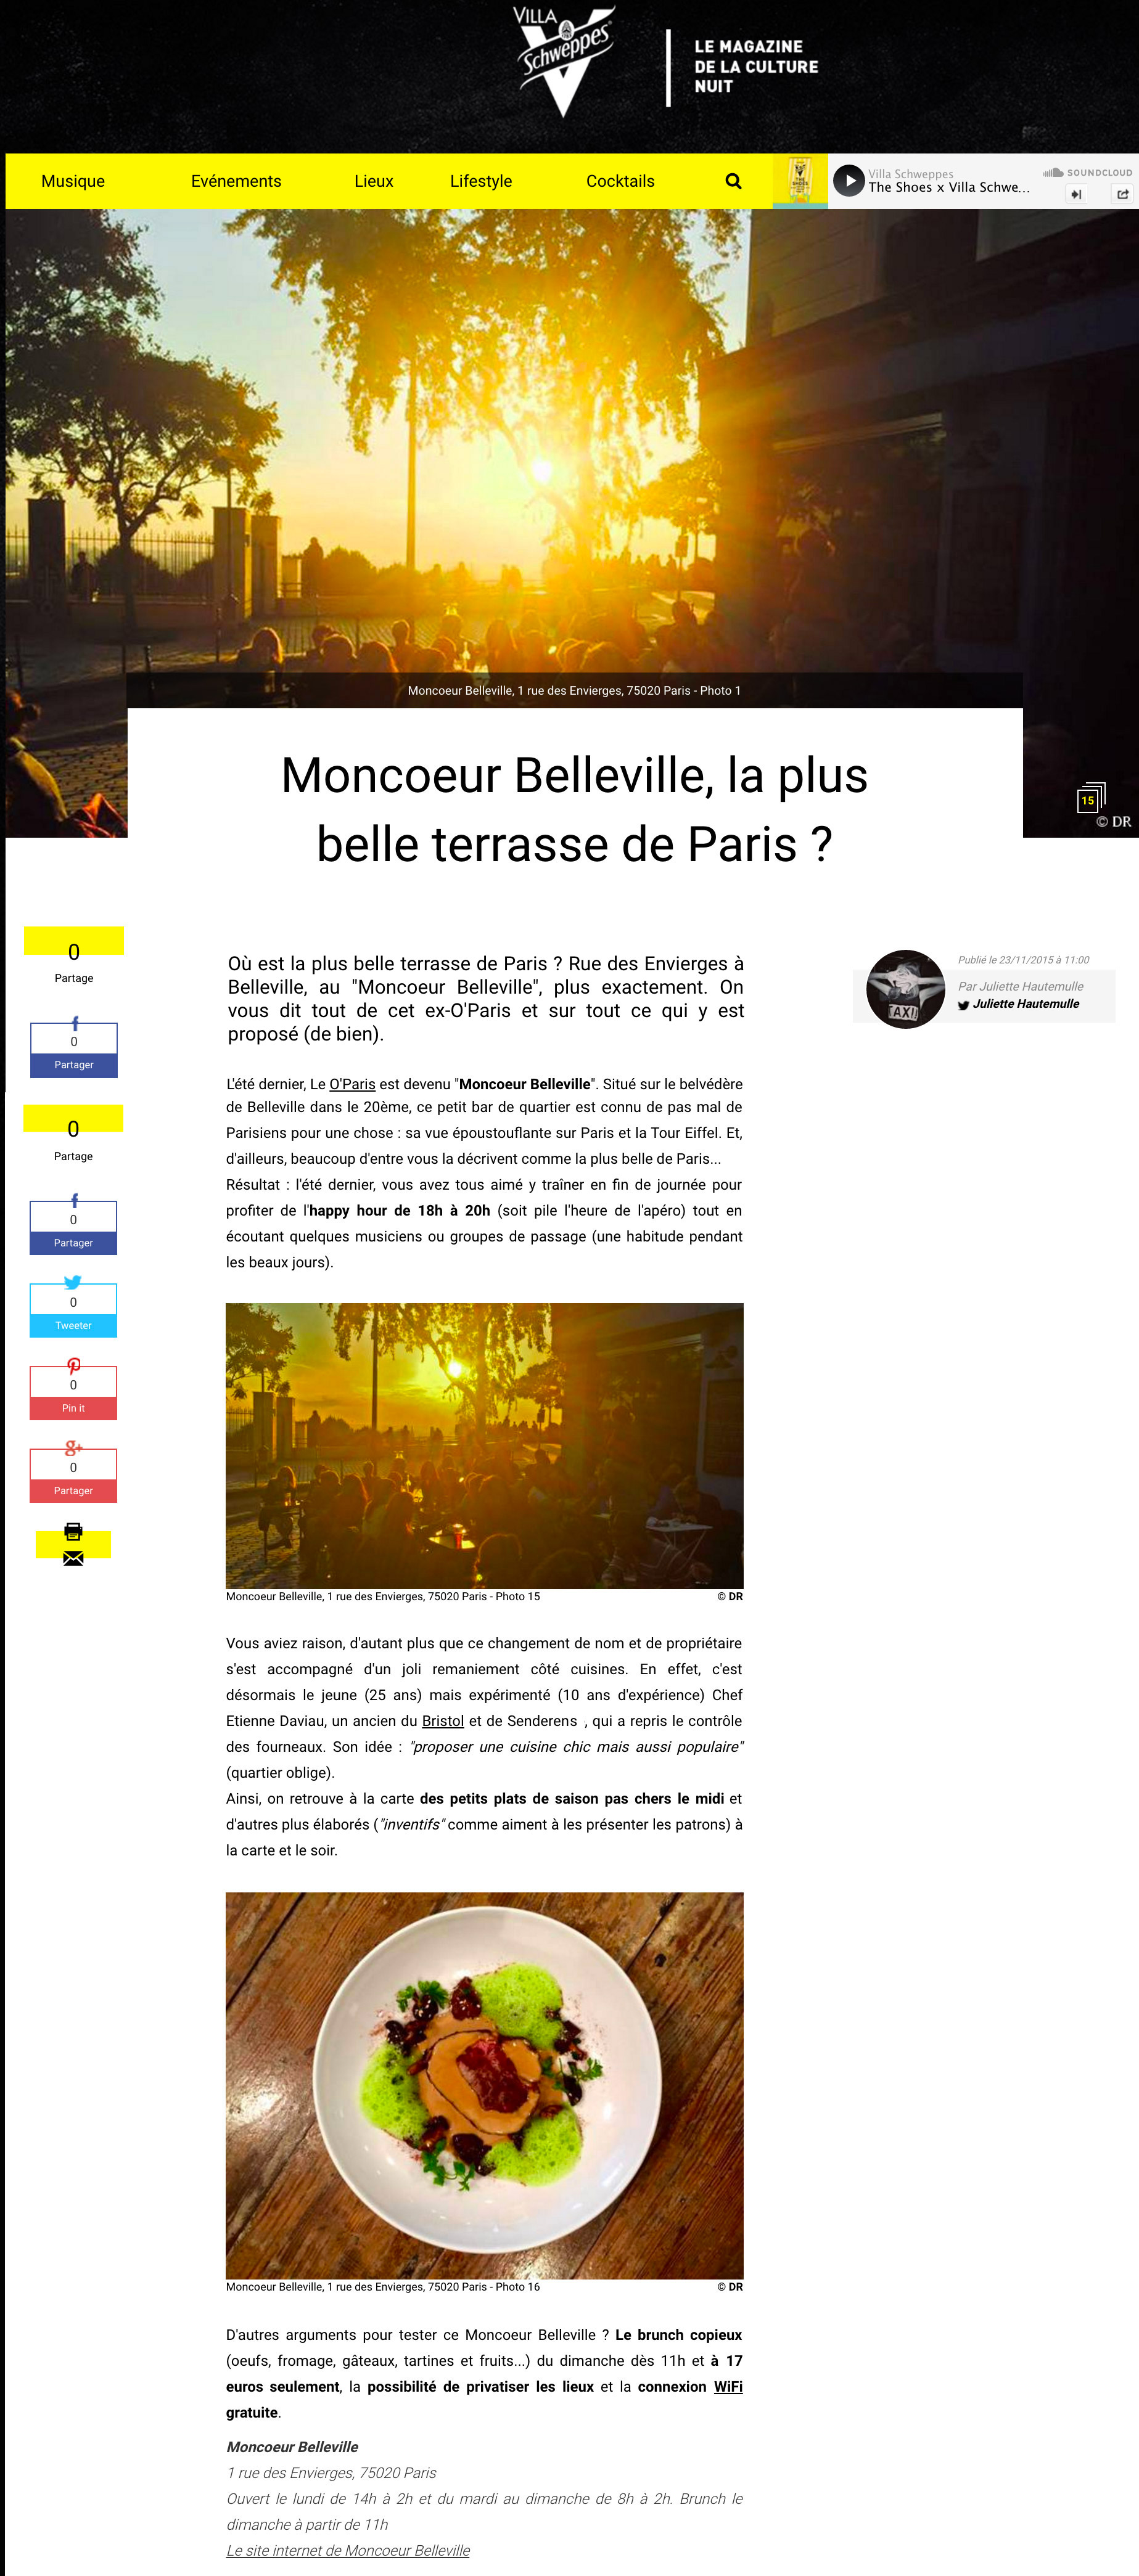 moncoeur-belleville-villa-schweppes-ok